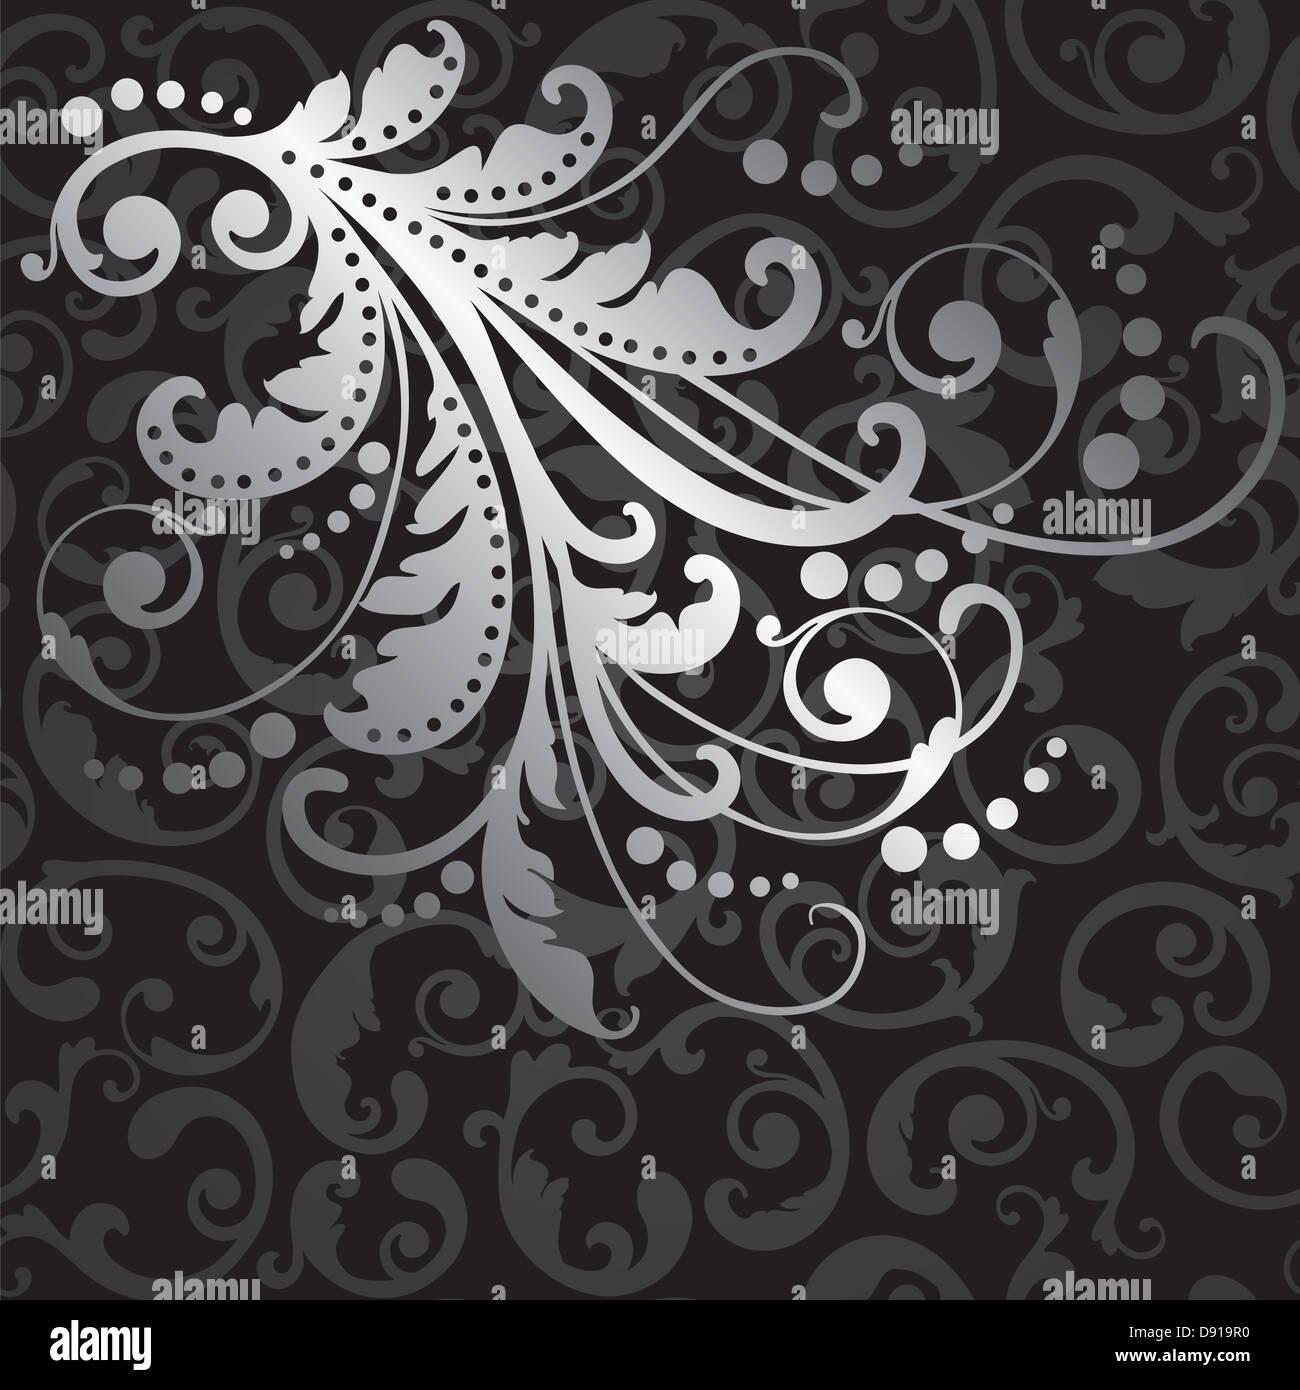 floral silver design element on seamless black swirls wallpaper pattern D919R0